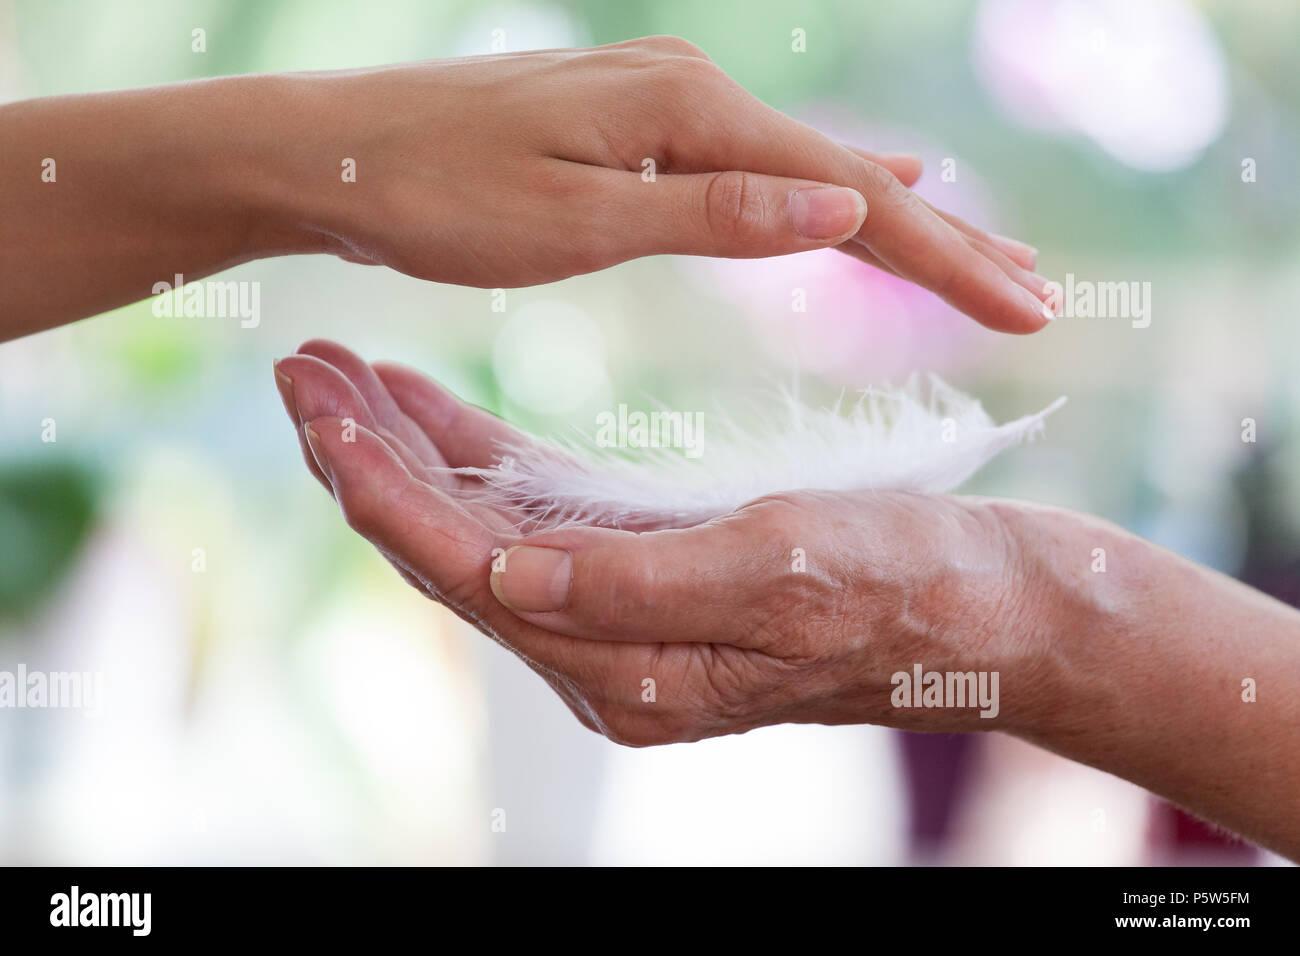 Demenz Beratung Handeln Hilfe consulting help Immagini Stock